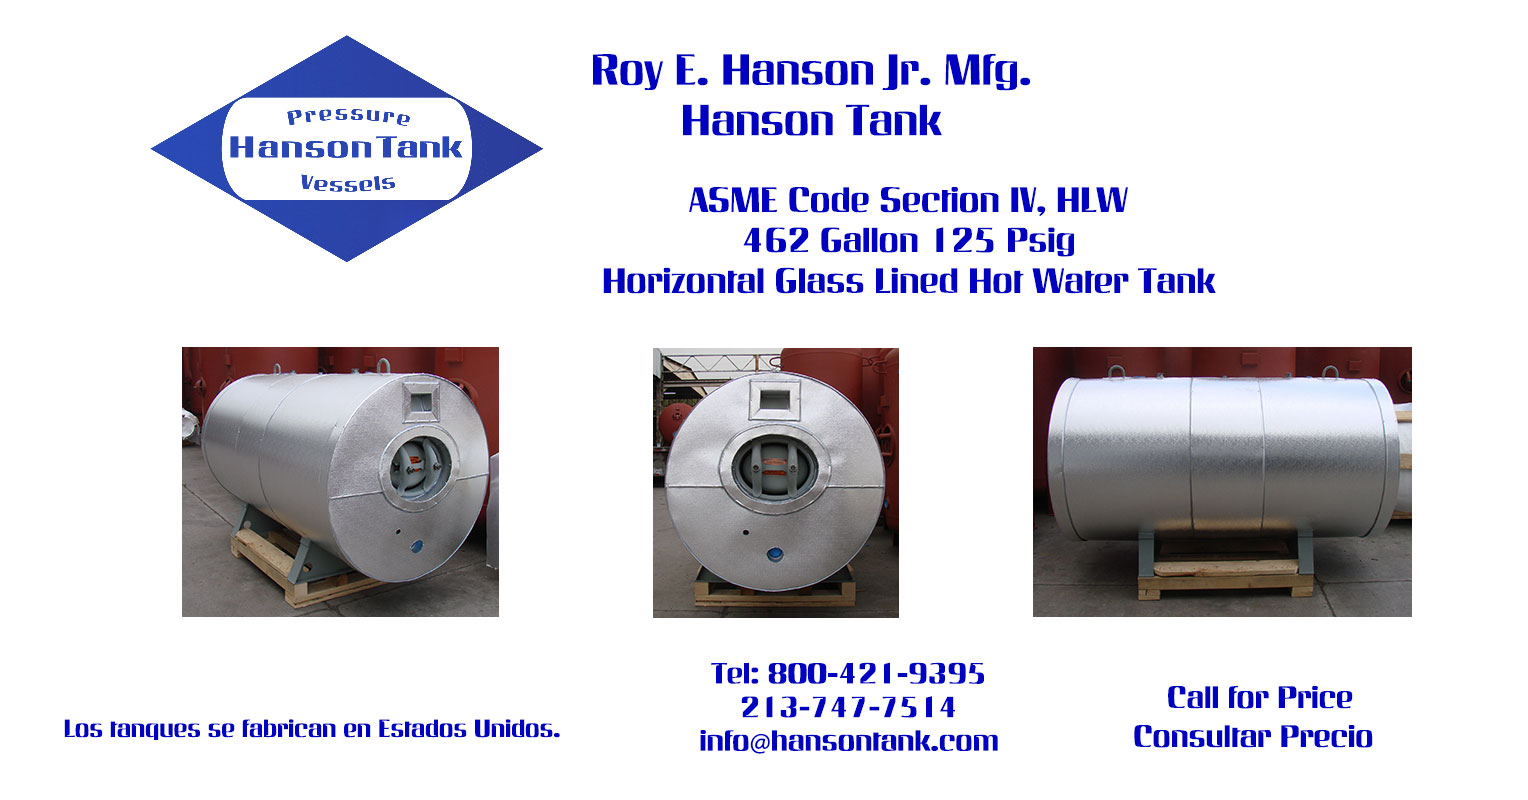 WG-993-B 462 Gallon Horizontal Hot Water Tank